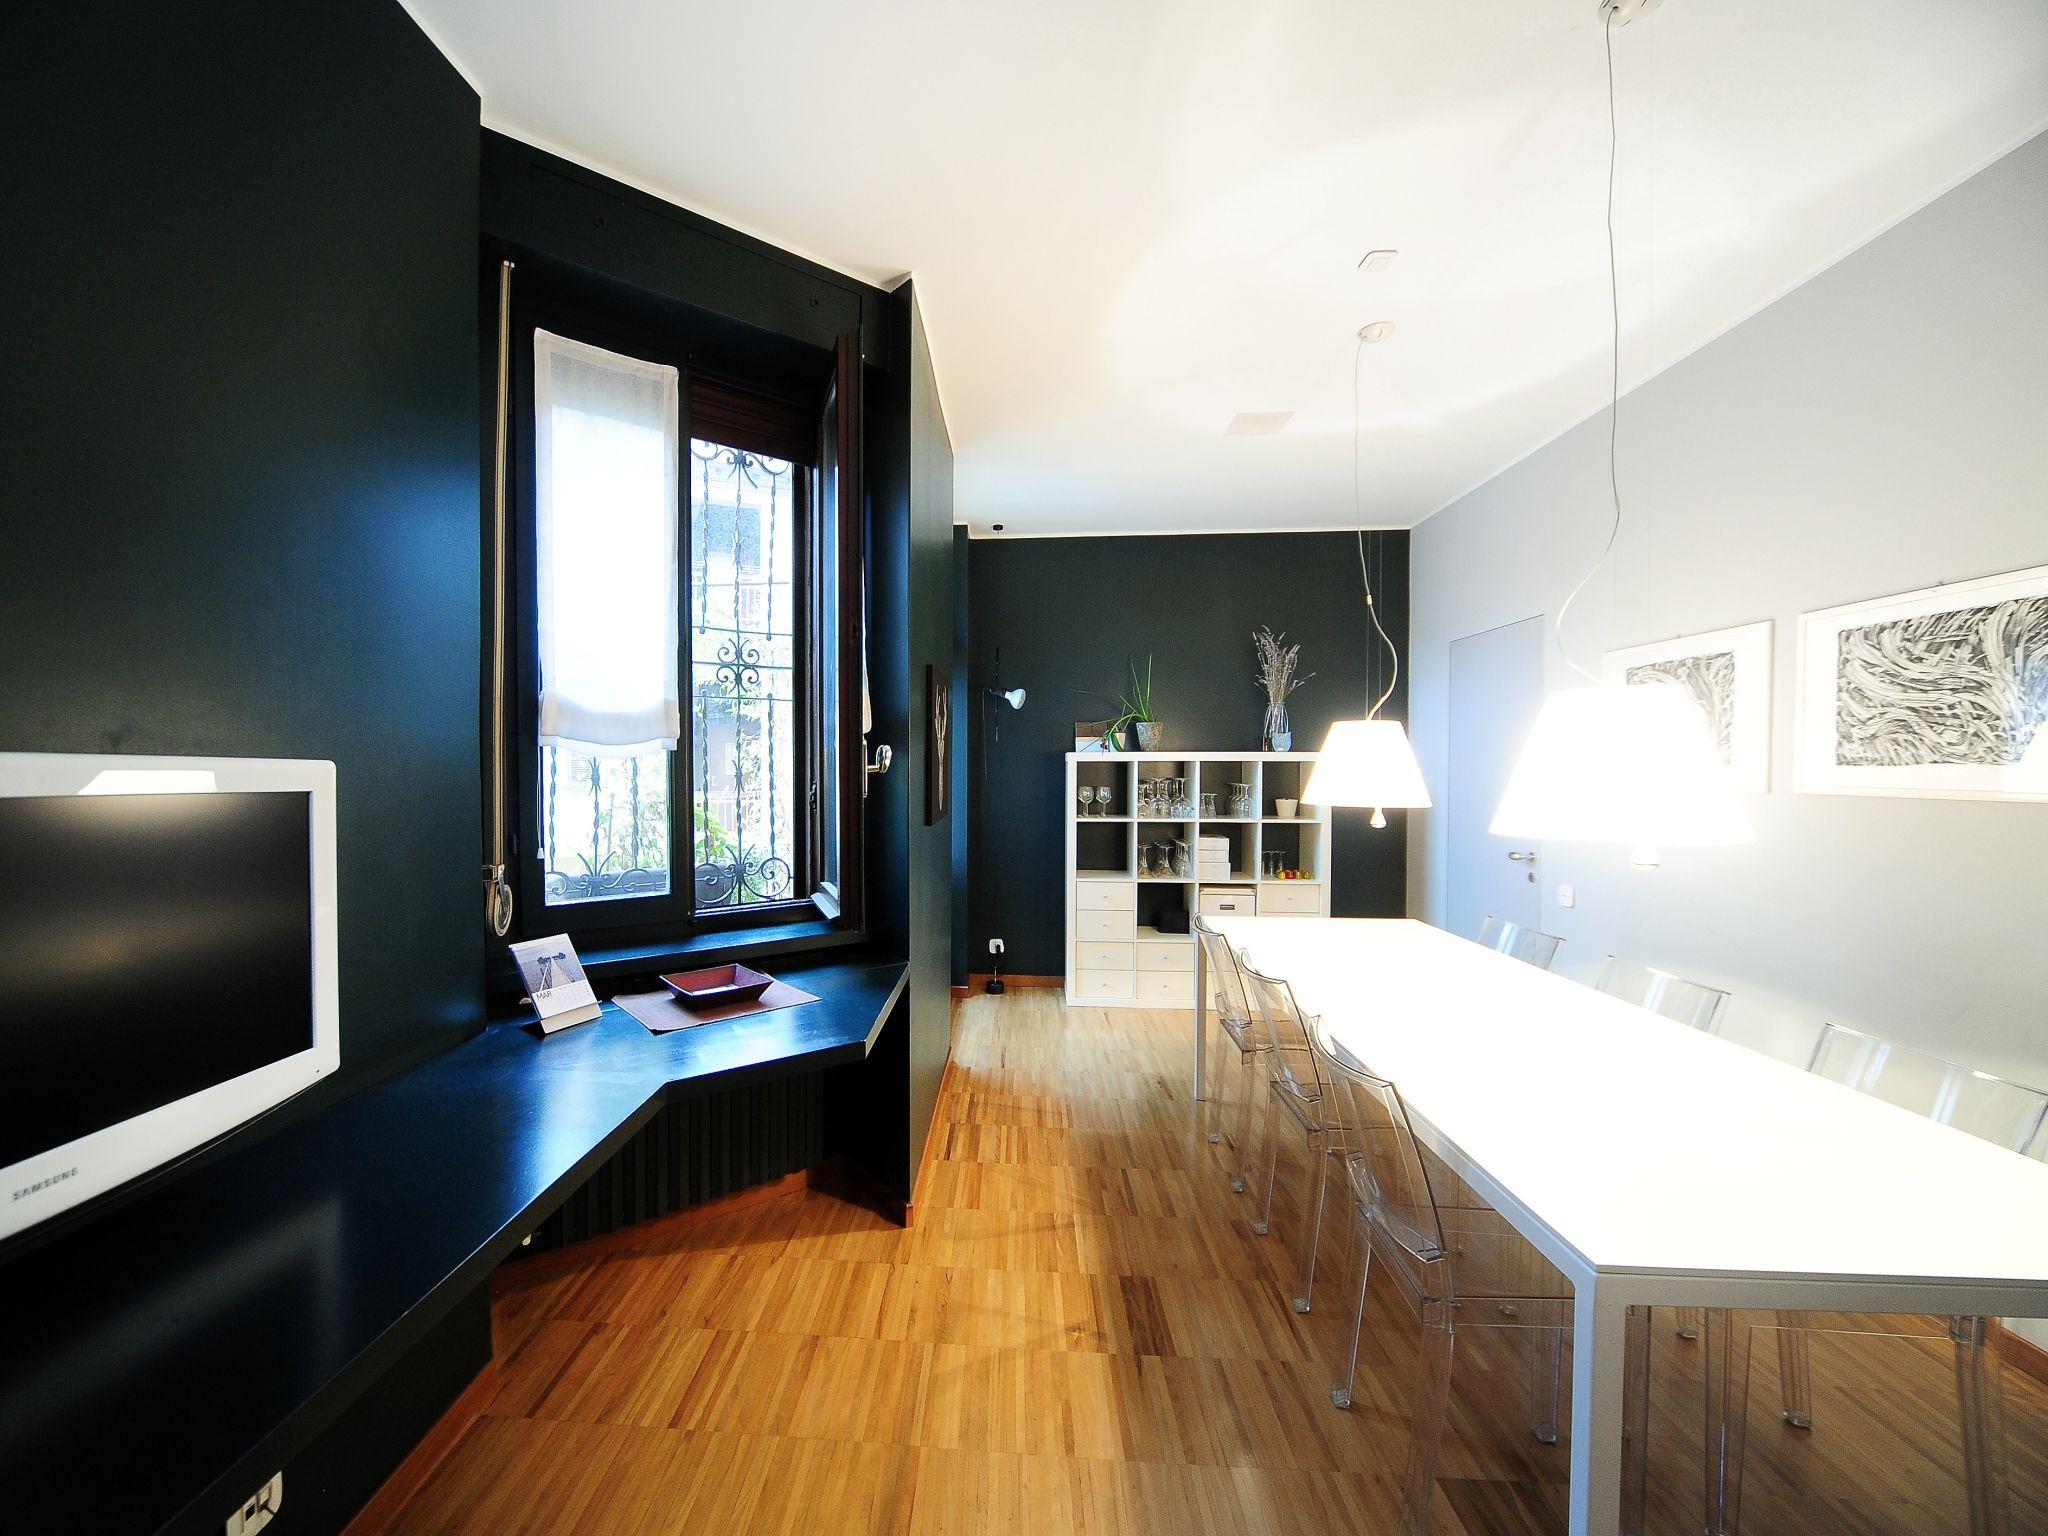 Urban District Apartments - Milan Isola Exclusive (1BR)